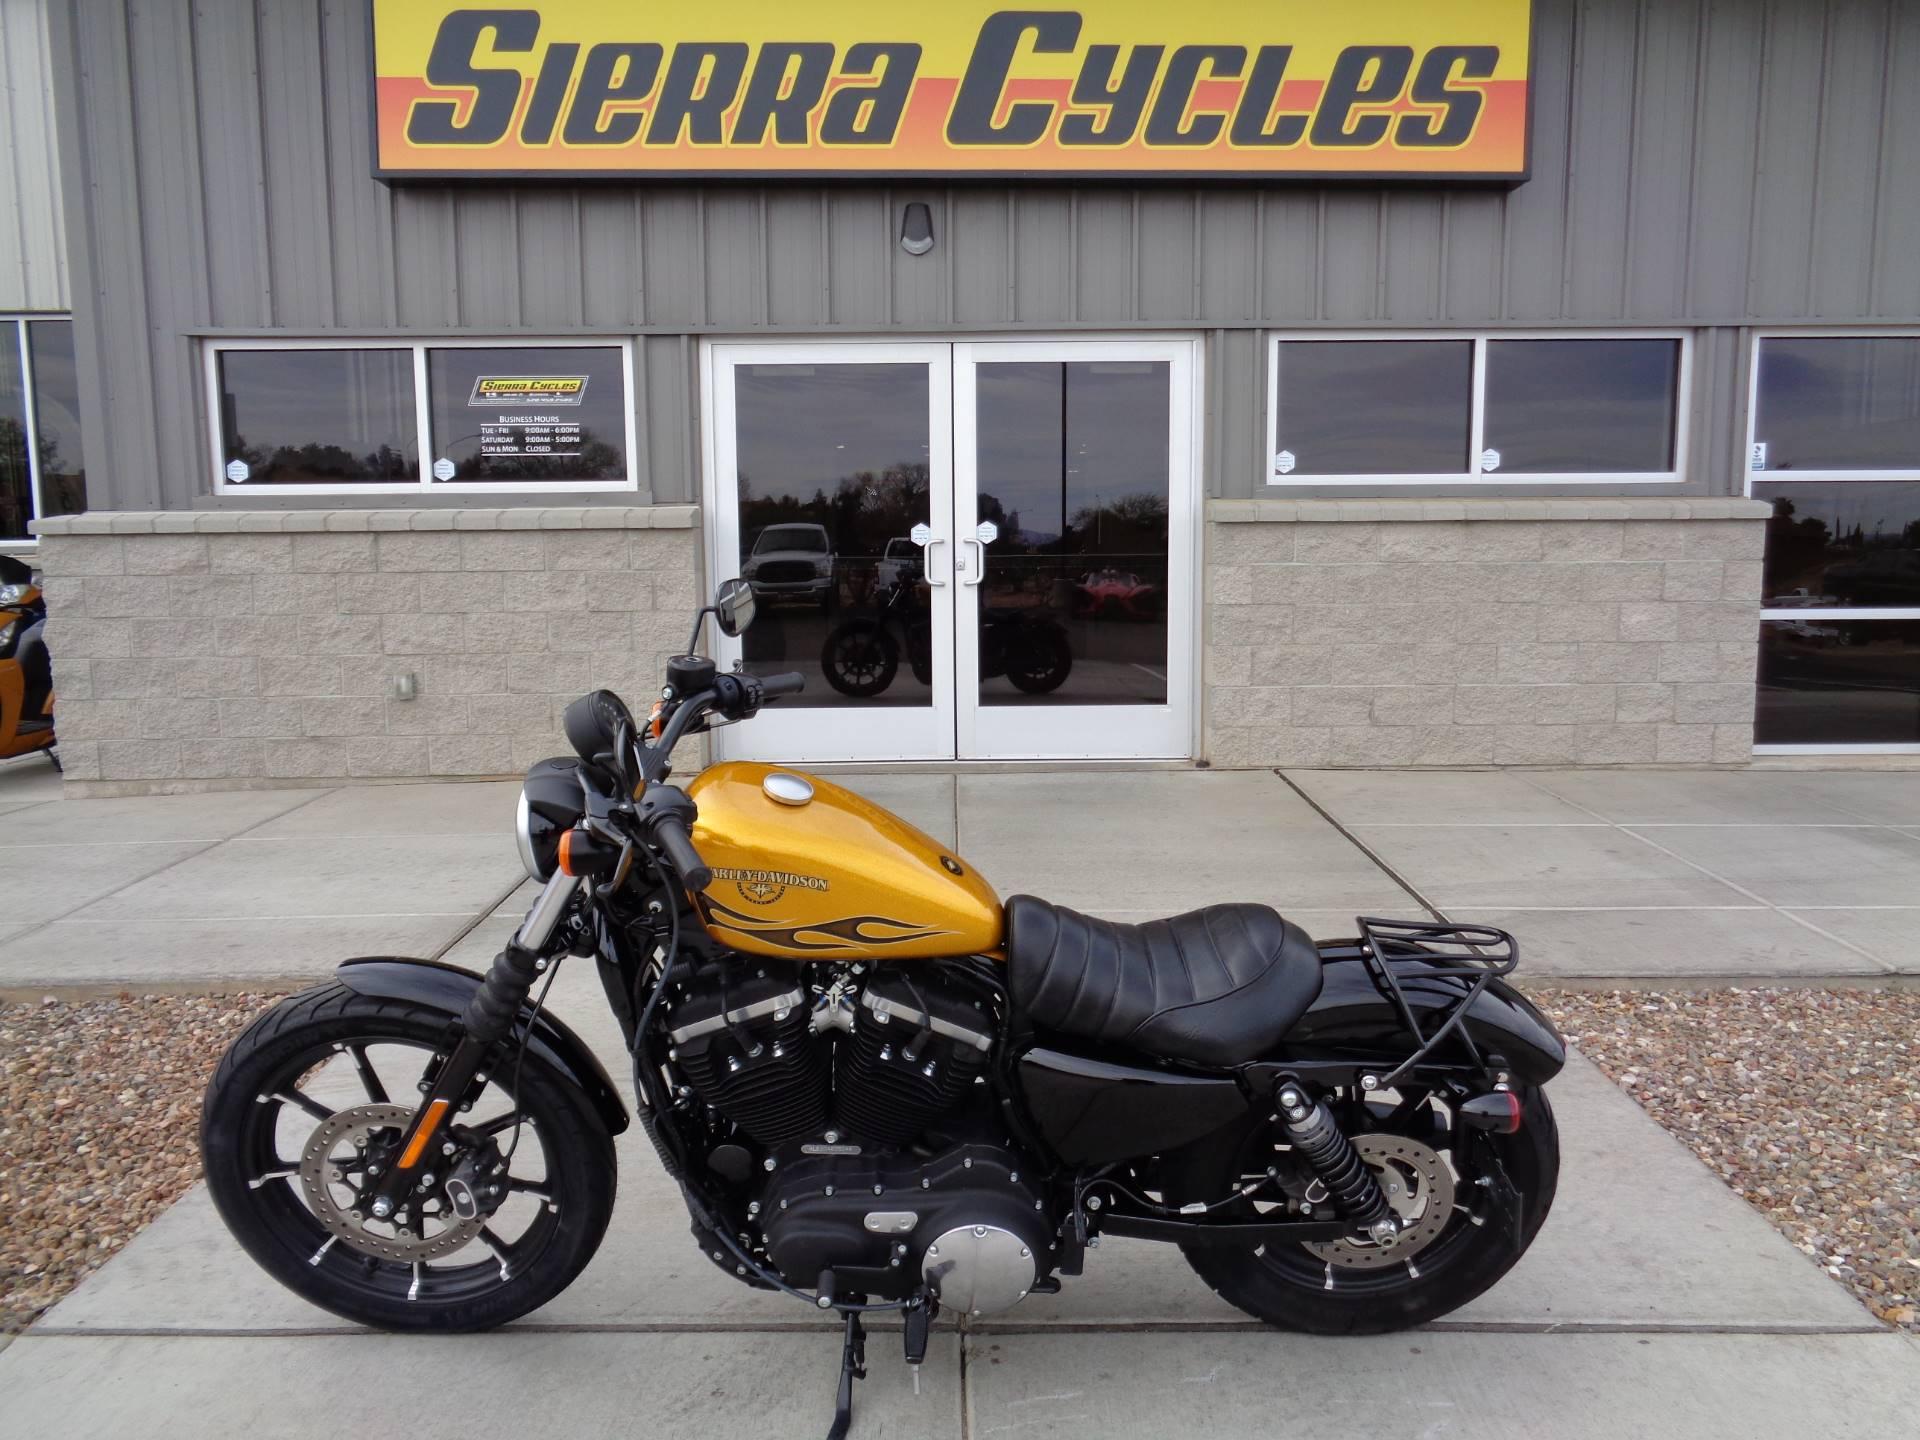 2016 Harley-Davidson Iron 883 1